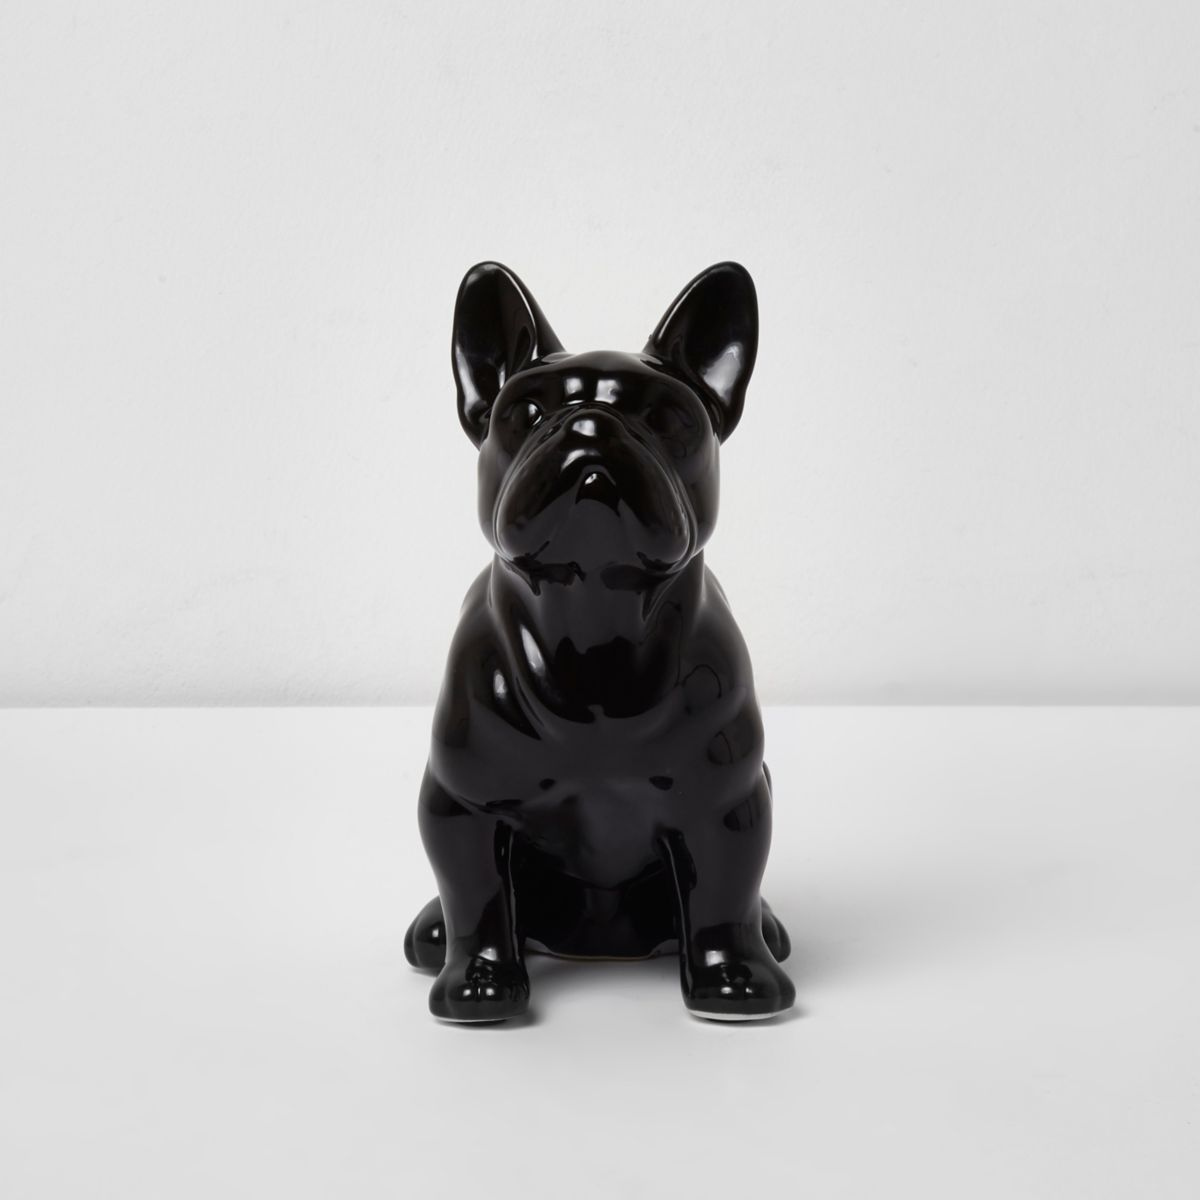 Black Sass & Belle French bulldog money box